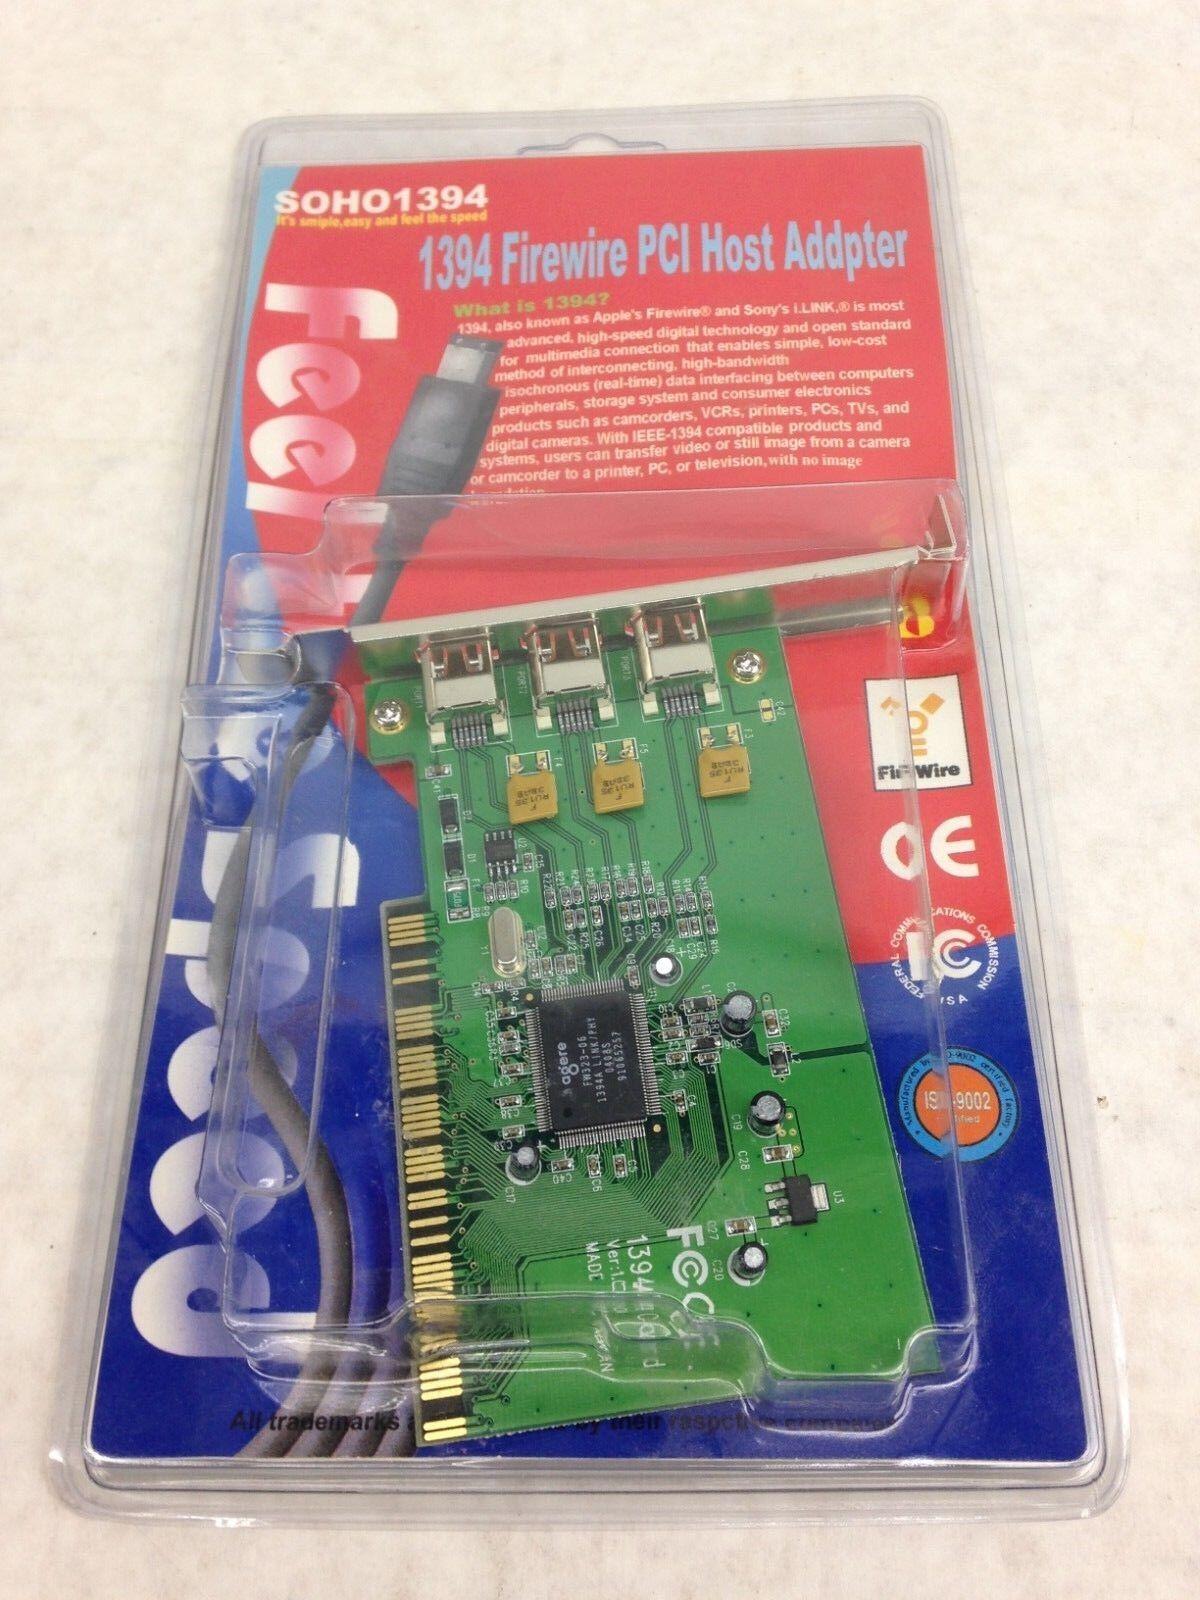 SOHO1394 Firewire PCI Host Adapter 15-102-013